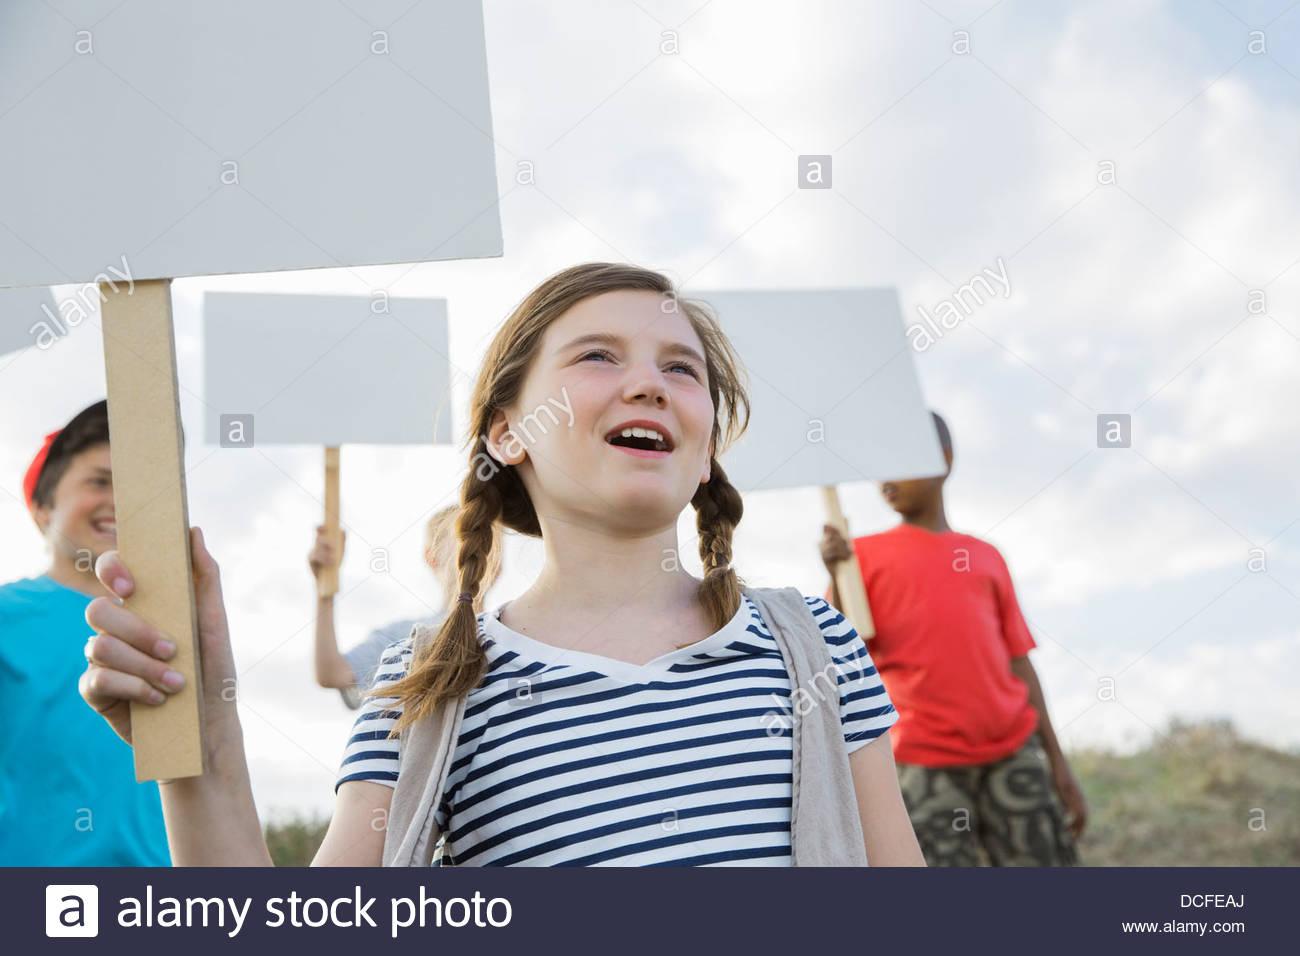 Cute girl holding blank billboard outdoors Photo Stock